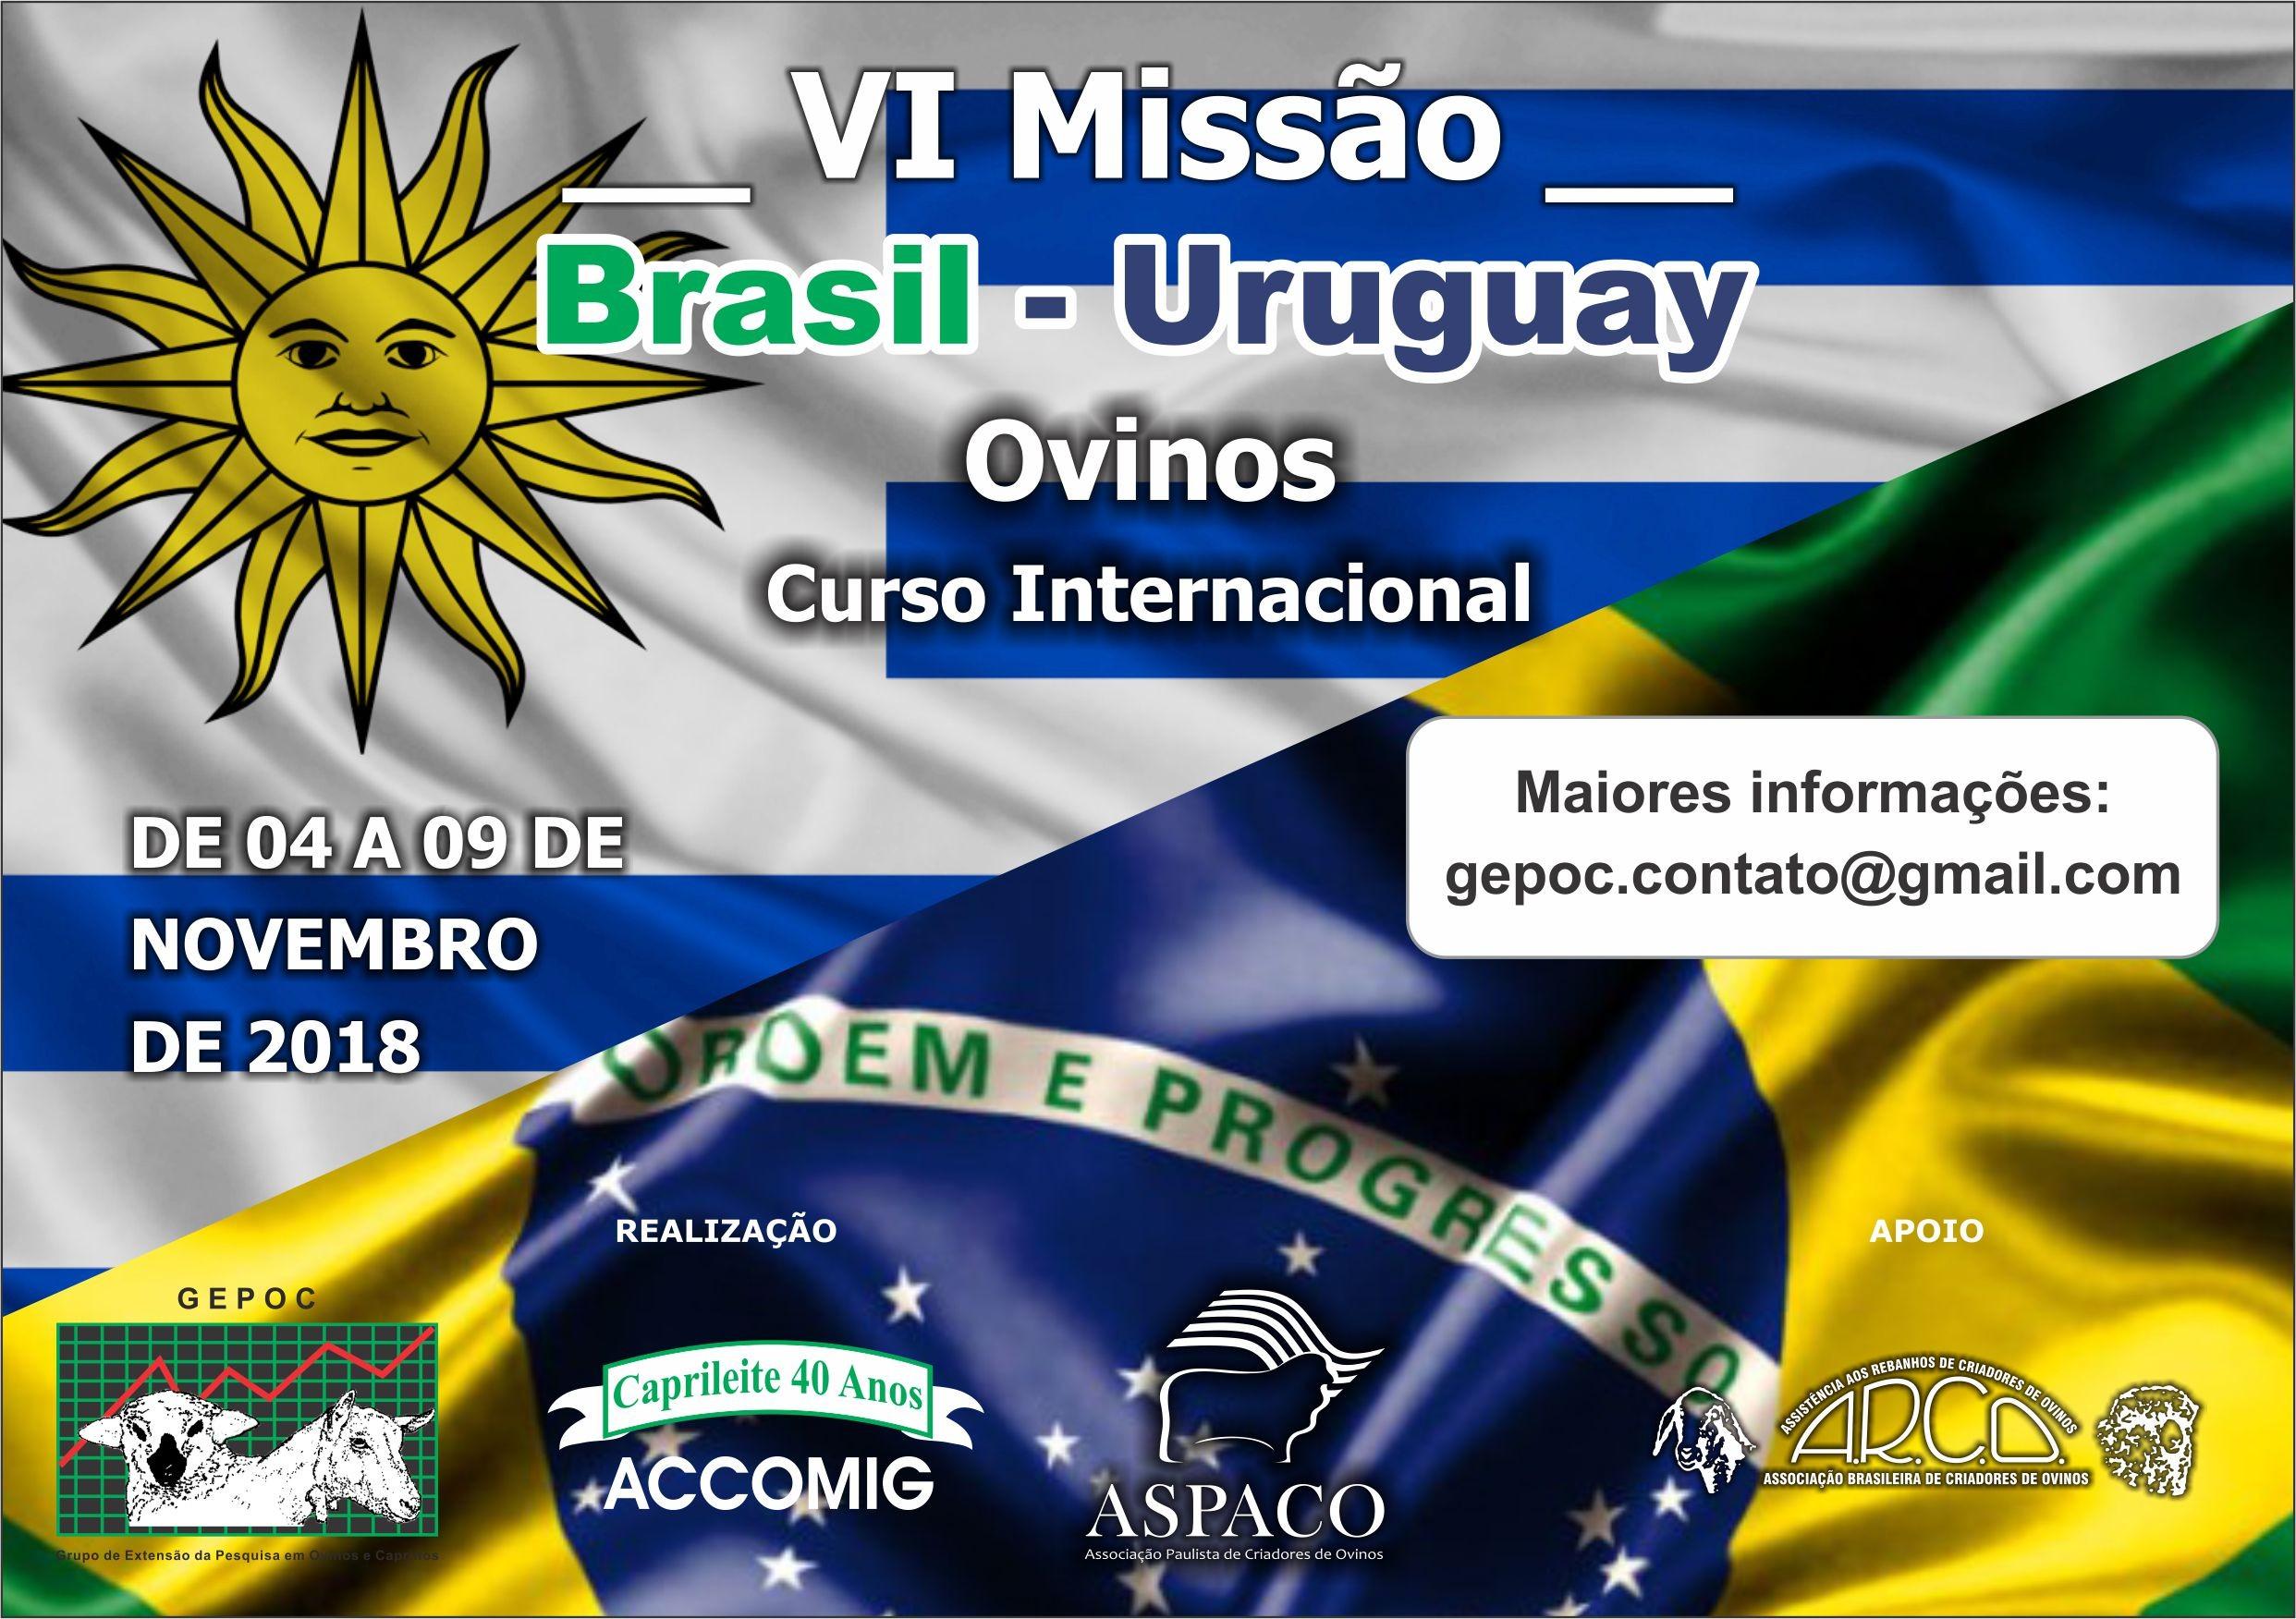 MISSÃO BRASIL &ndashURUGUAY OvinosCarne e L&atildecom Leite &ndashPrograma Cordero Pesado de 04 a 09/11/2018